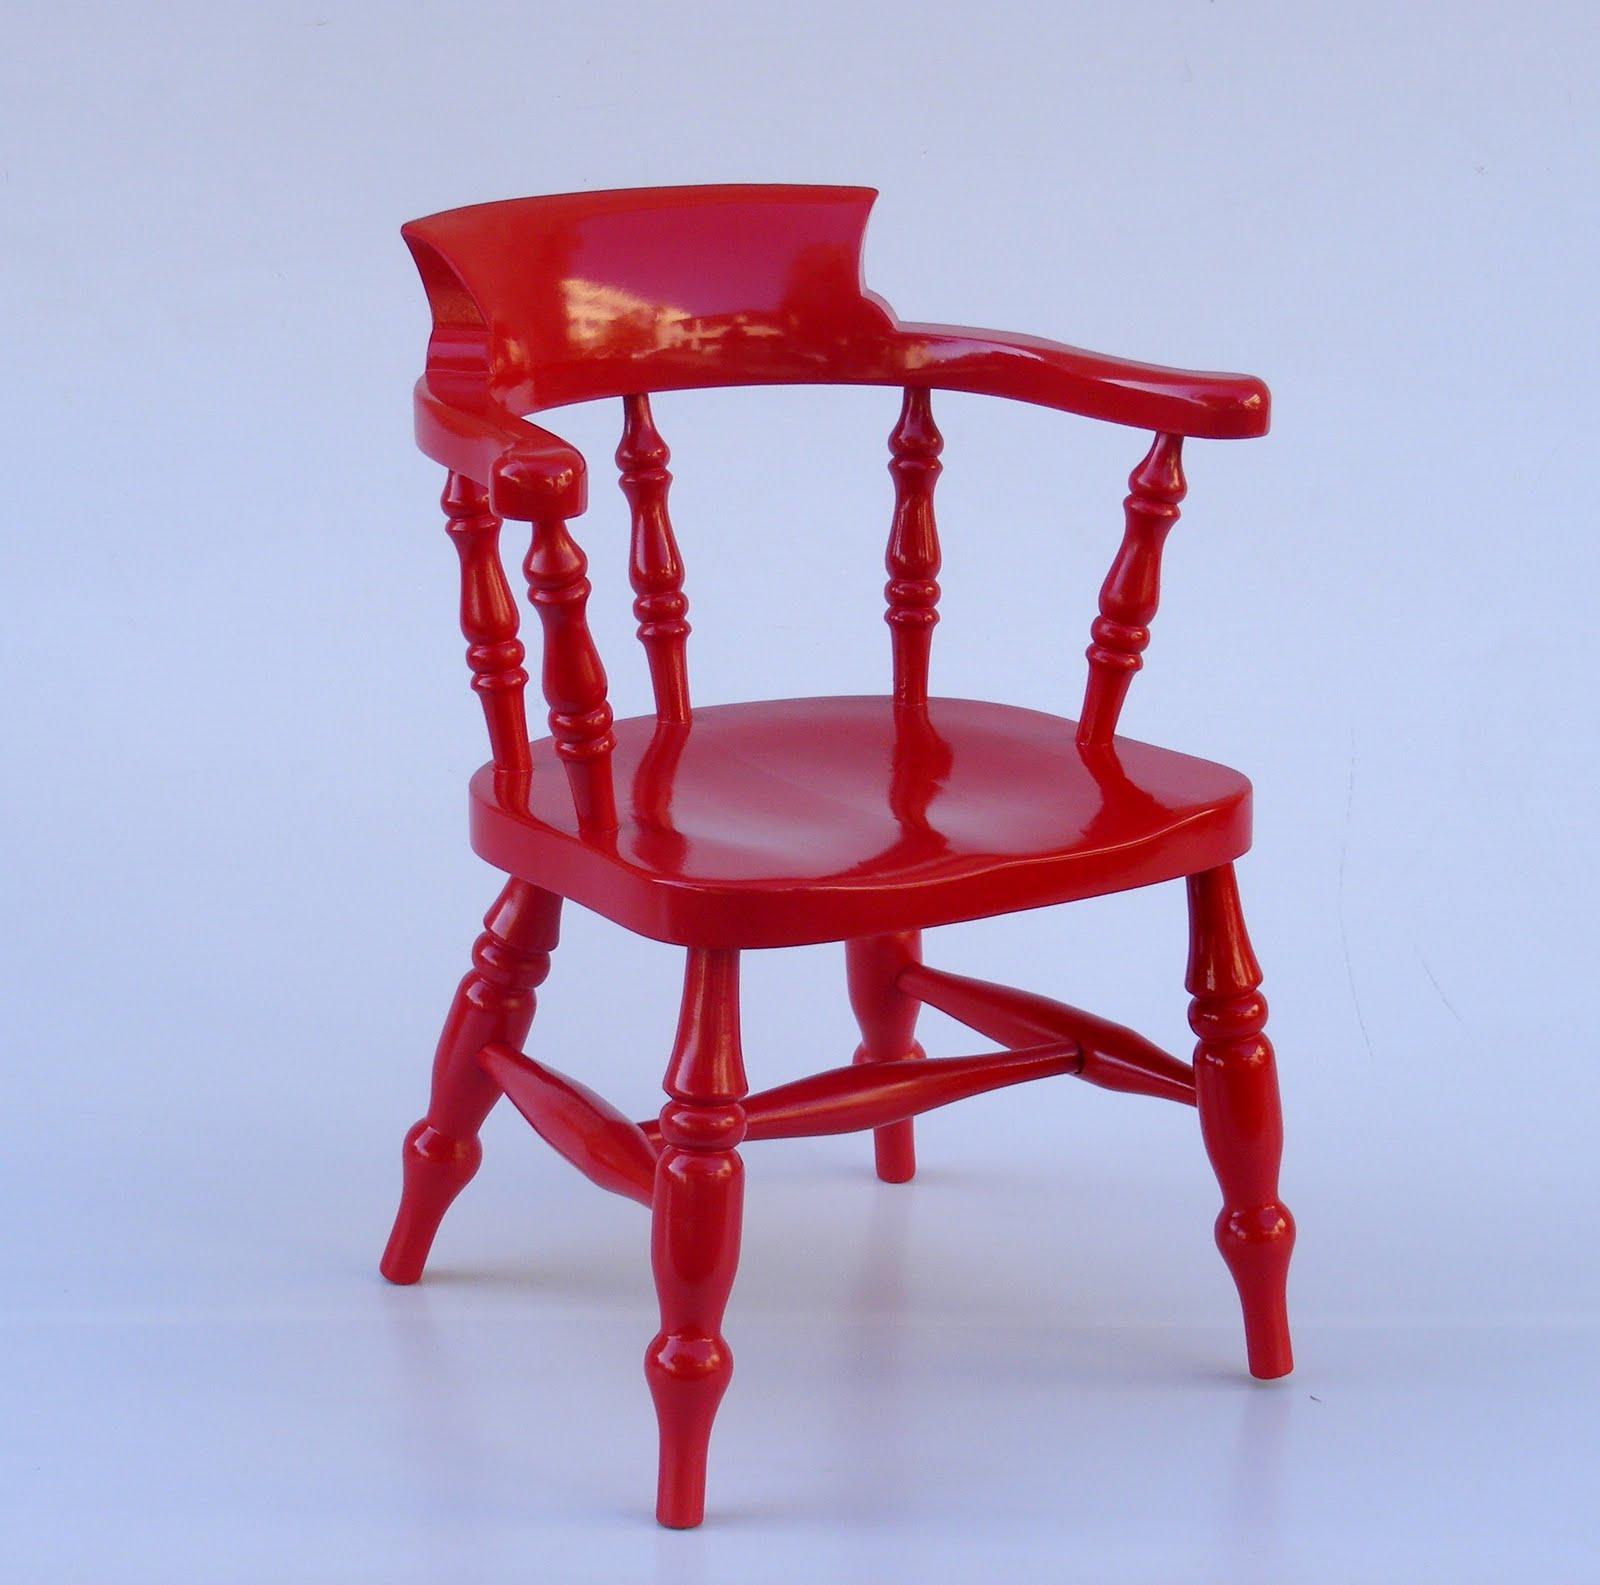 Cosco High Chair Ebay Electronics Cars Fashion